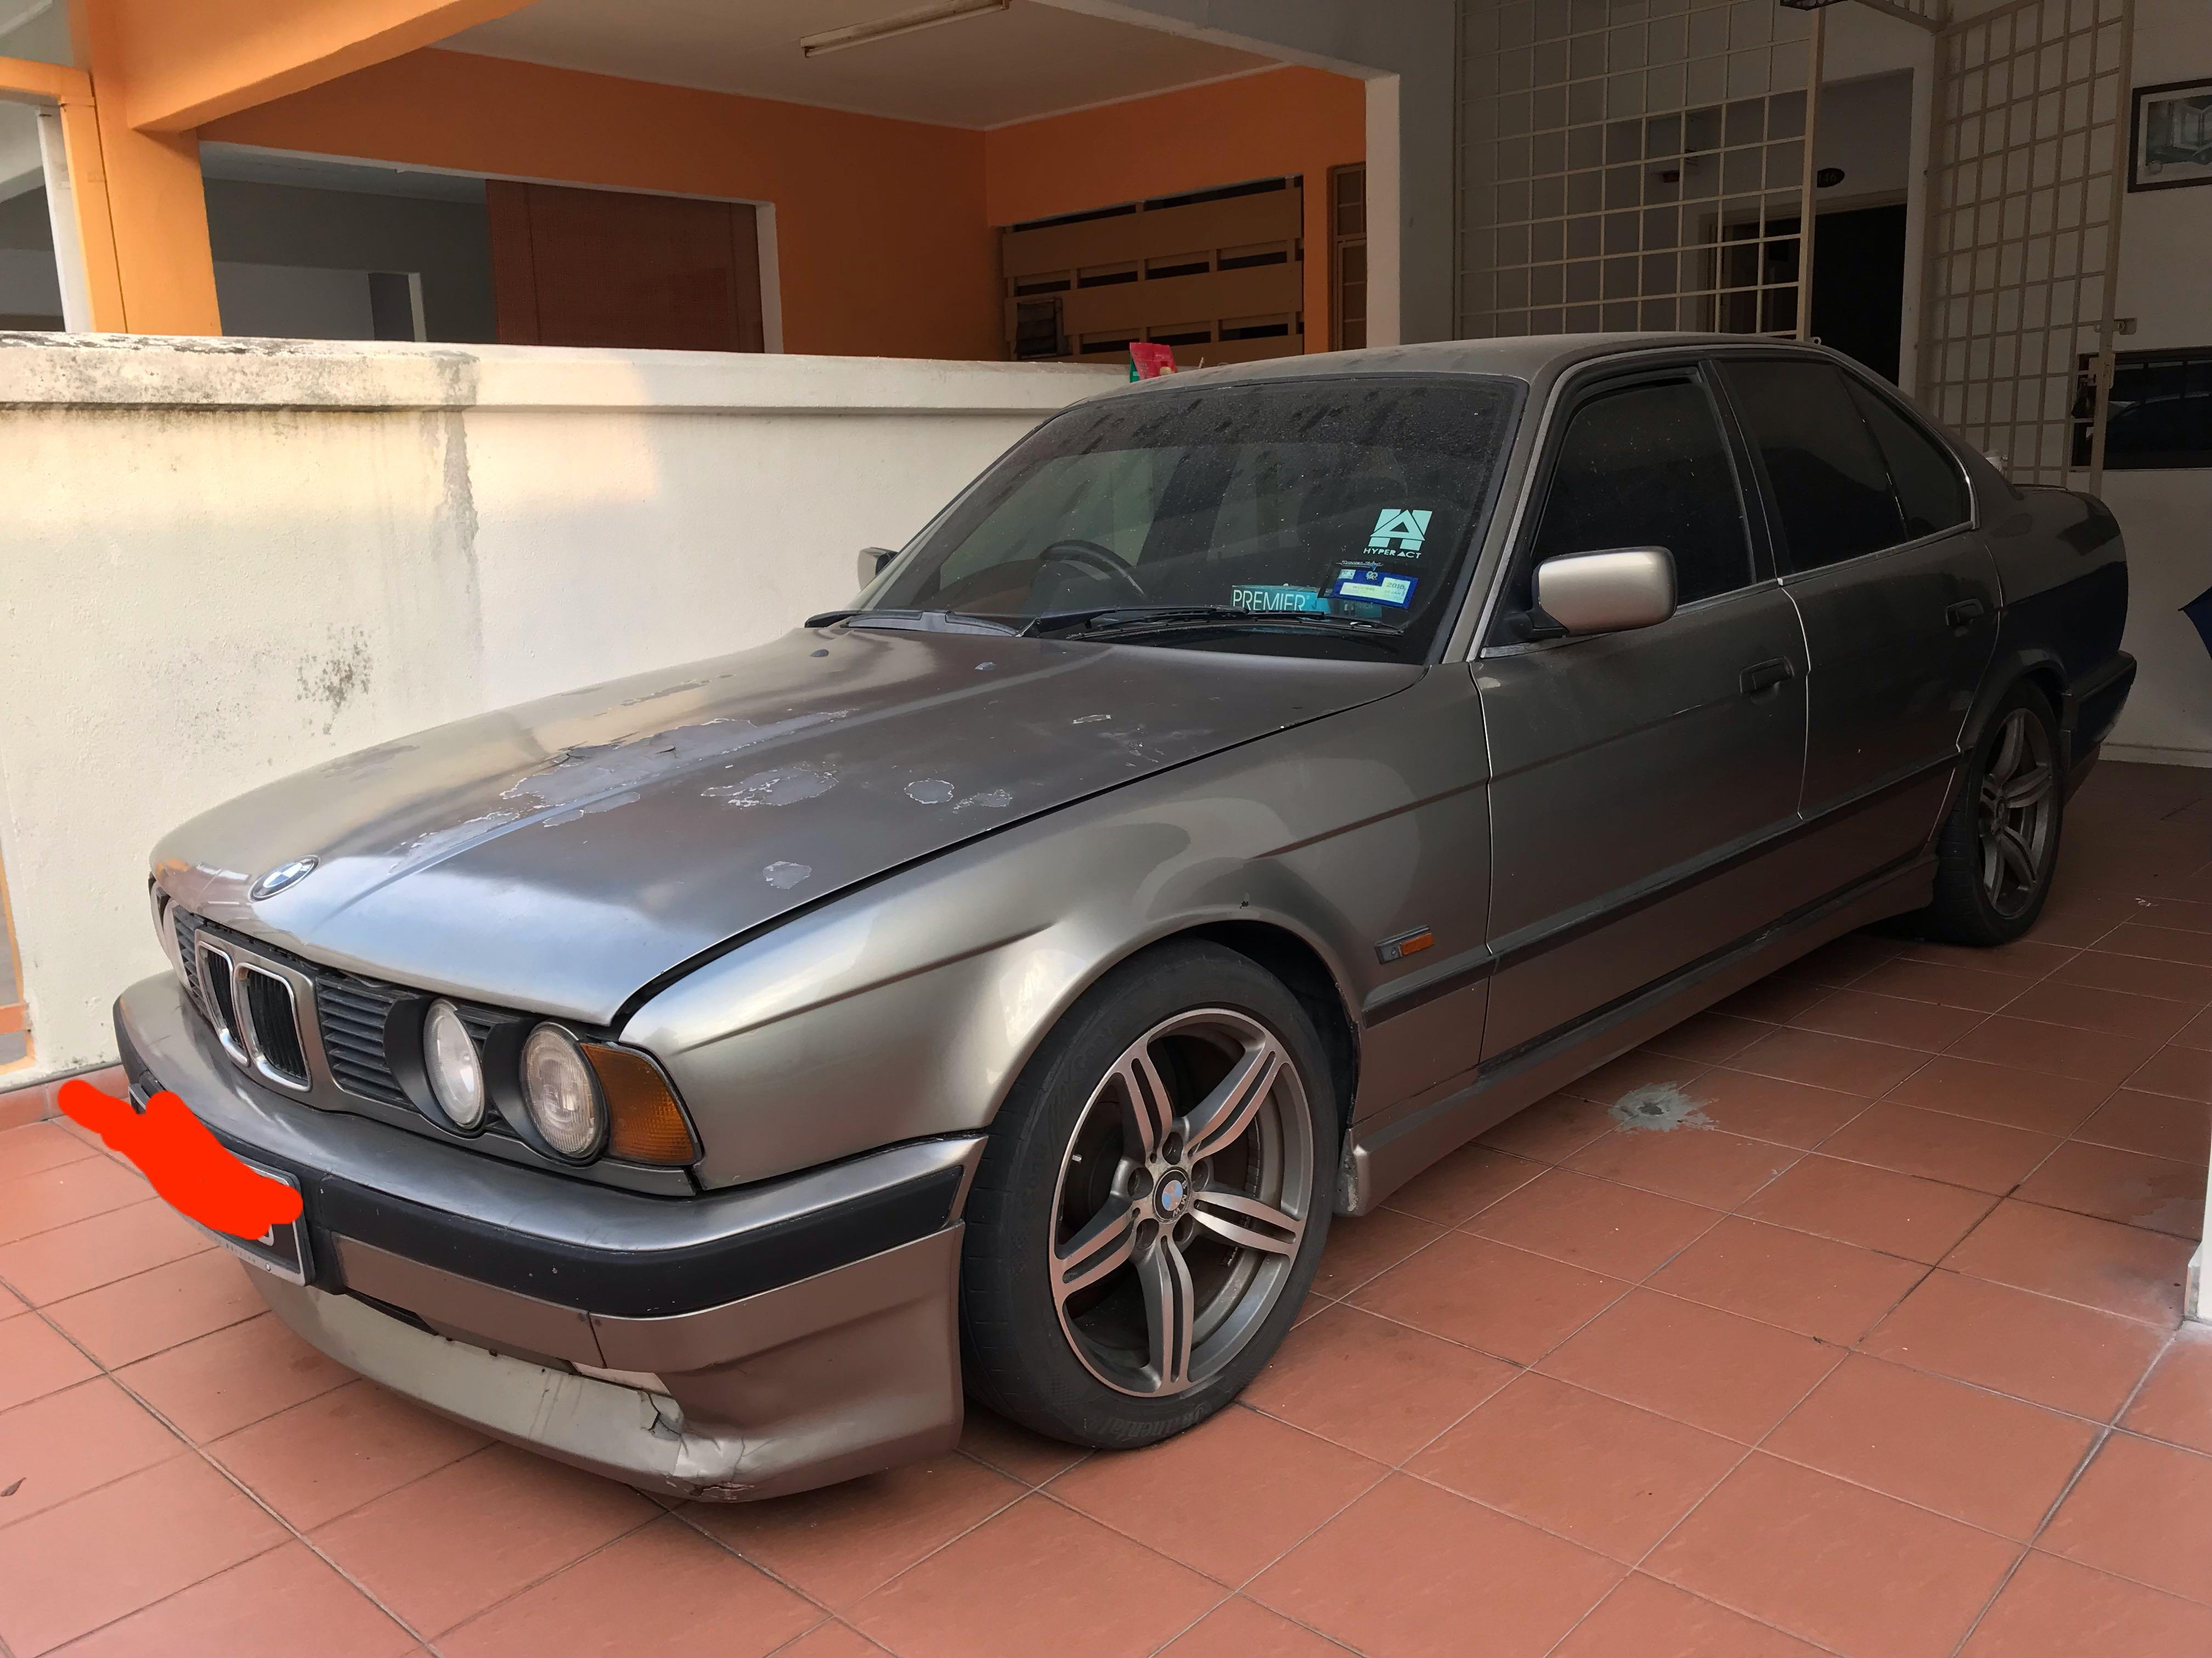 BMW E34 (5 series)